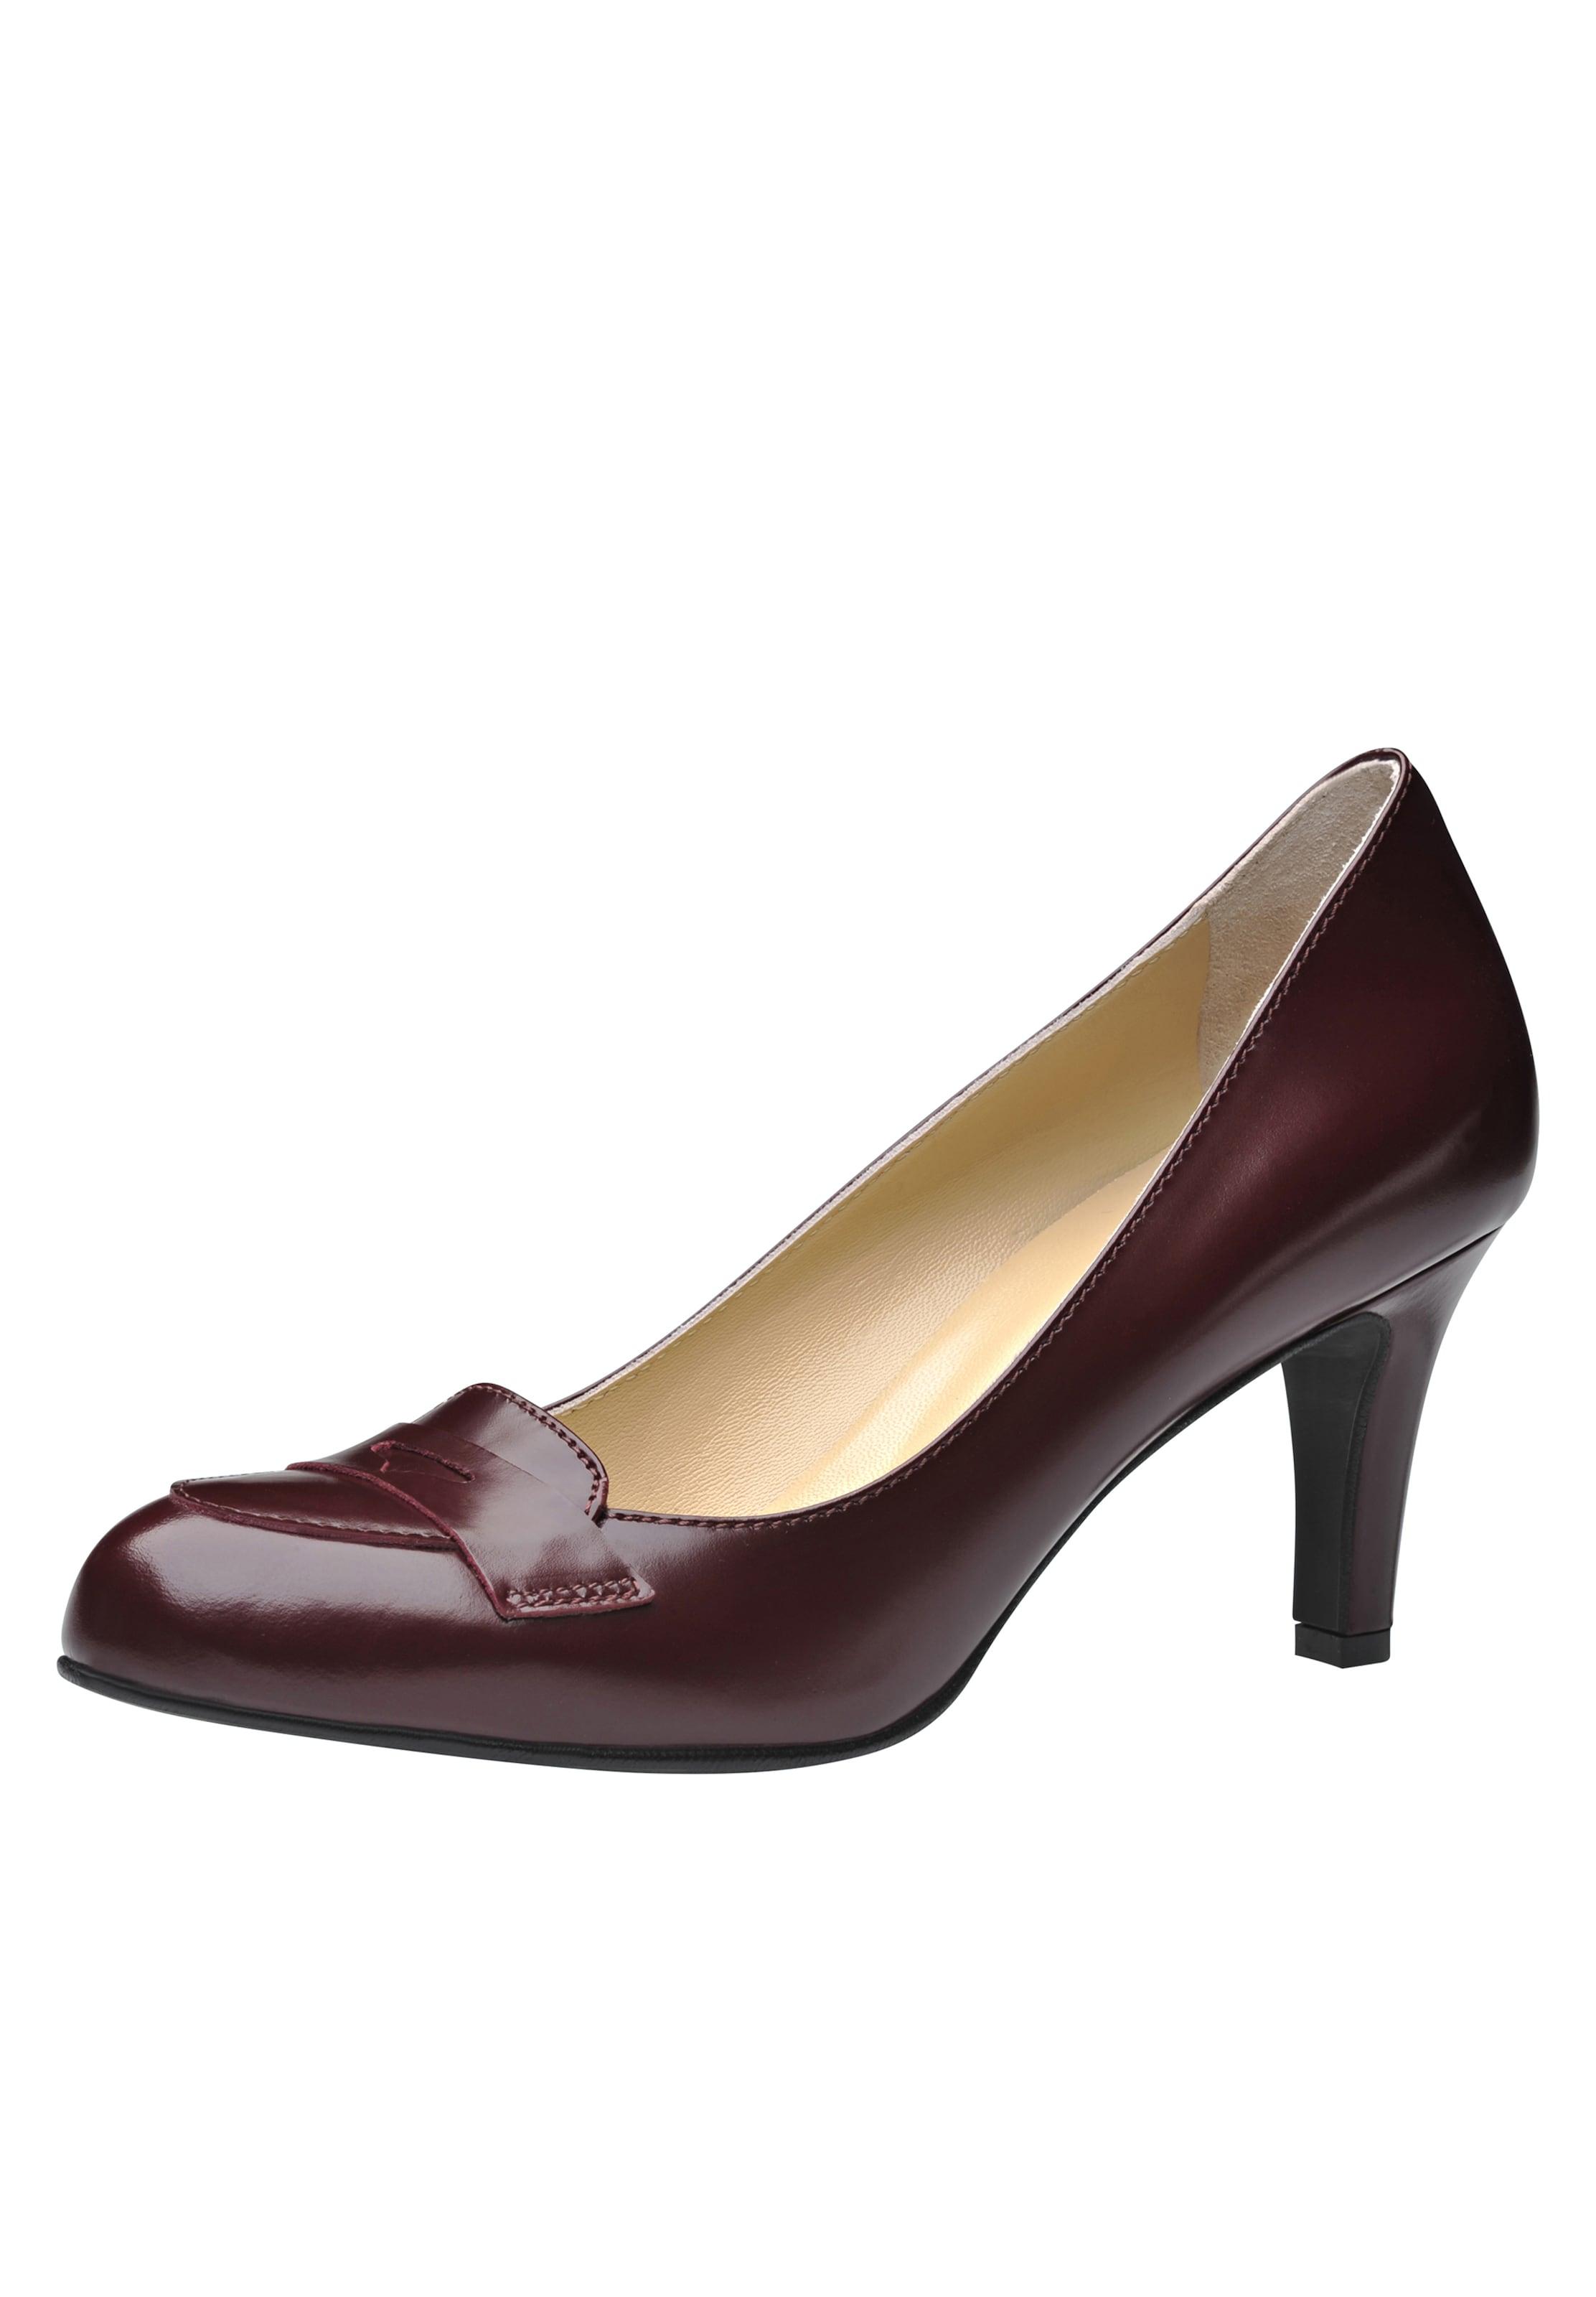 Evita Bordeaux Pumps In Damen Evita uFK53lT1Jc